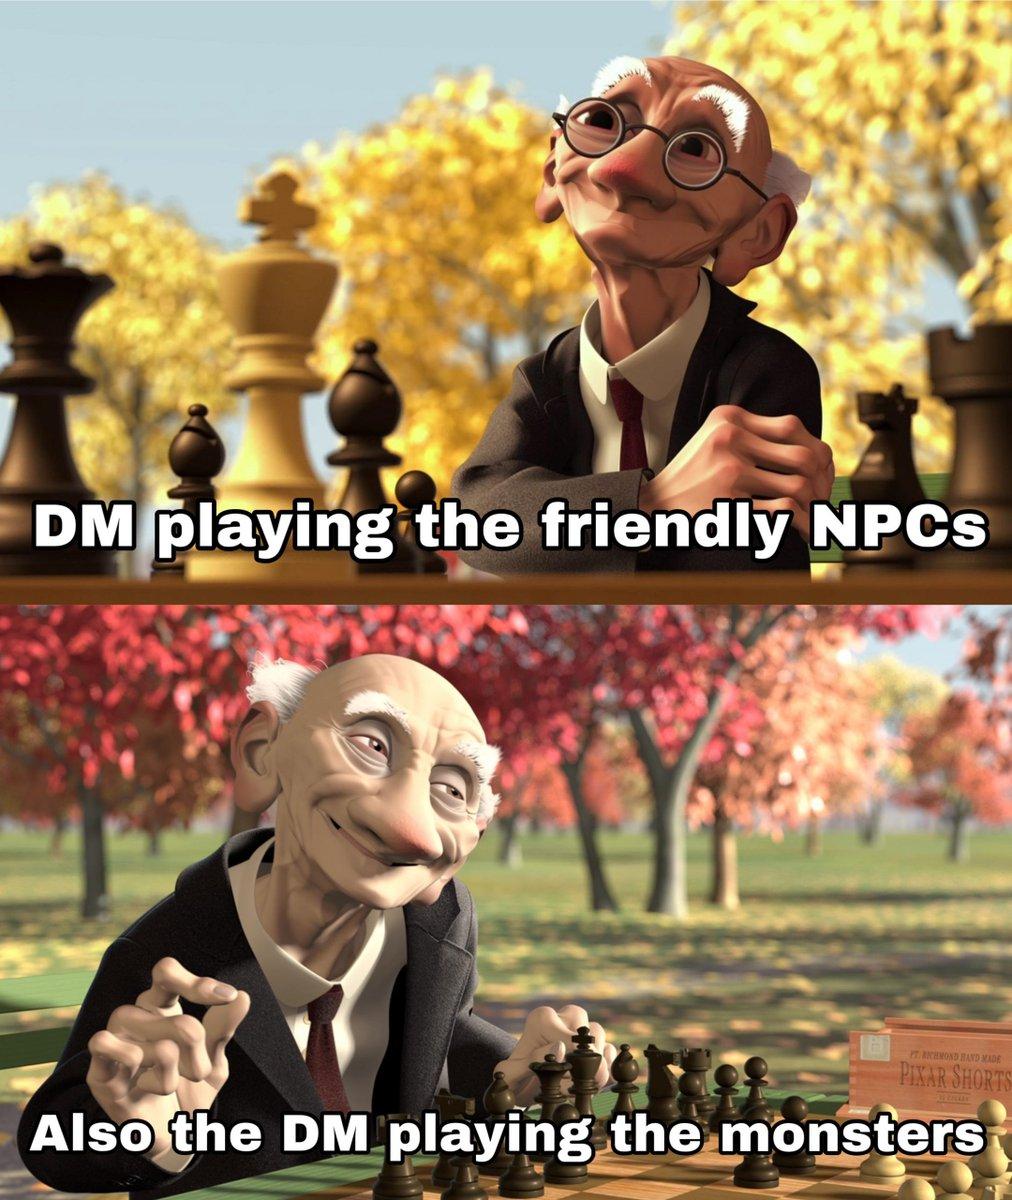 Ah, the duality of man  #dnd  #gamenight #dndminiatures #dnd5e  #funny  #follow  #clericpic.twitter.com/nxagmgxnCz